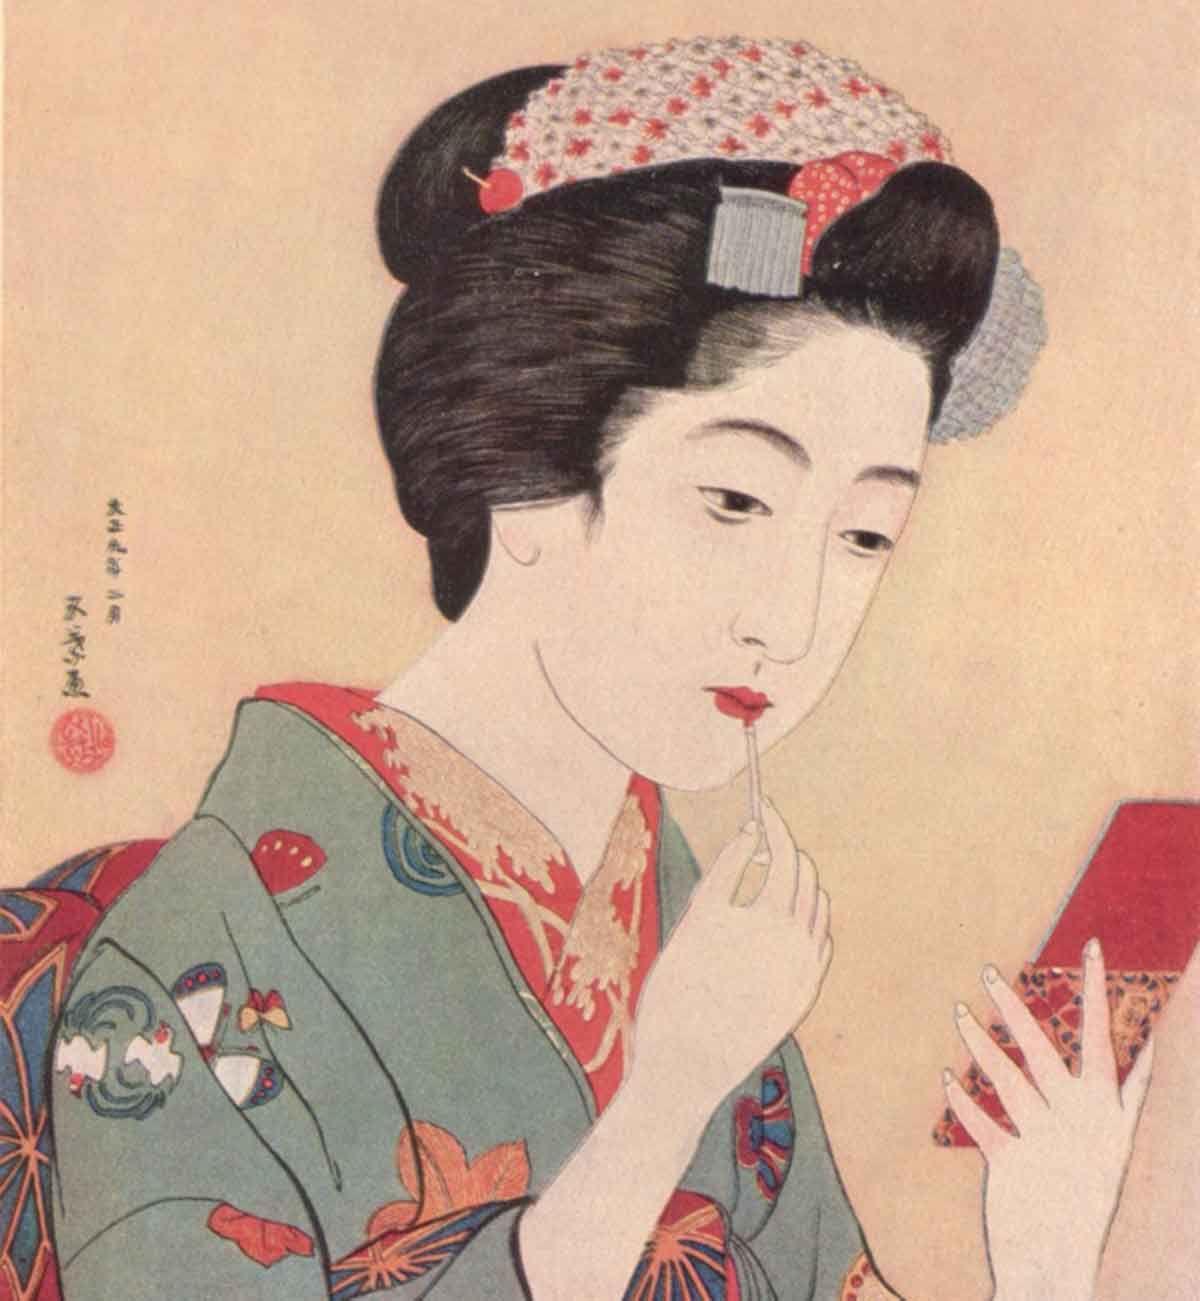 Genuine woodprint painting of geishas has left